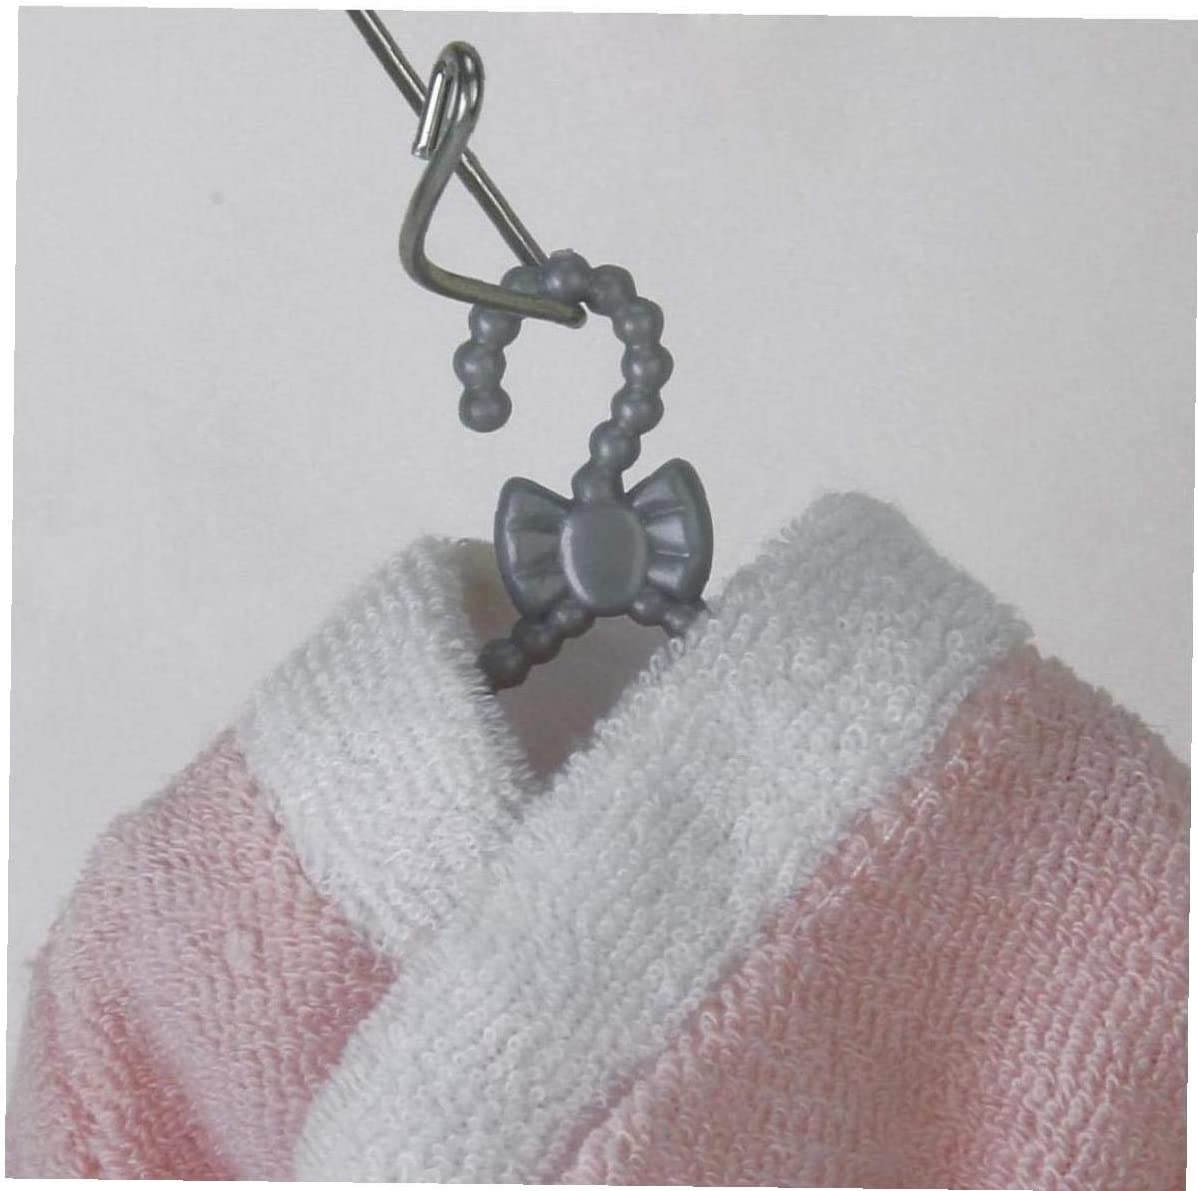 ZCHD 12pcs Pl/ástico Gris Mini Perchas De Ropa para Mu/ñecas 11.5 En Girl Outfit Use Perchas